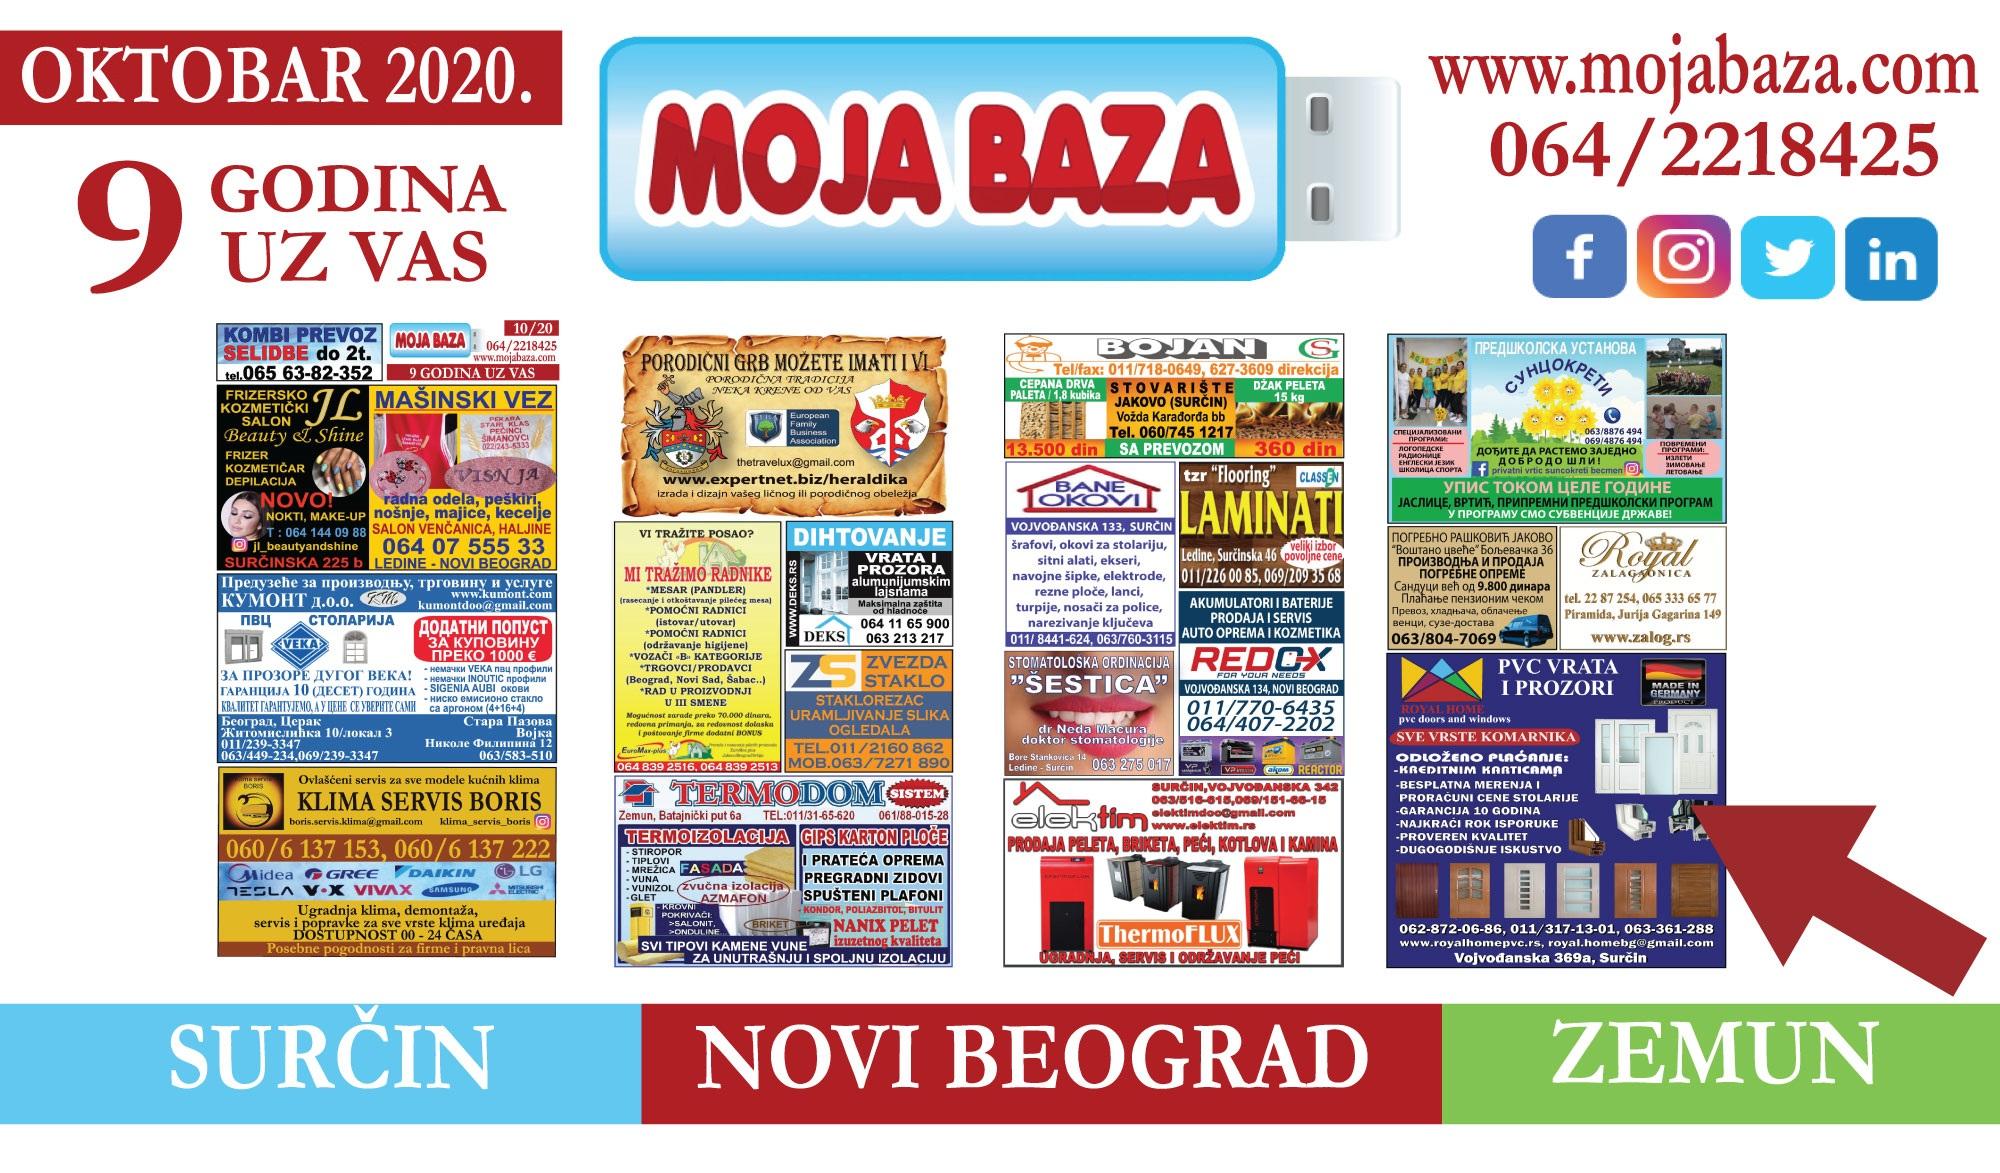 01Mojabazaoglasi-katalog-elektronski-surcin-novibgd-blokovi-ezanija-zemunaltina-zemunpolje